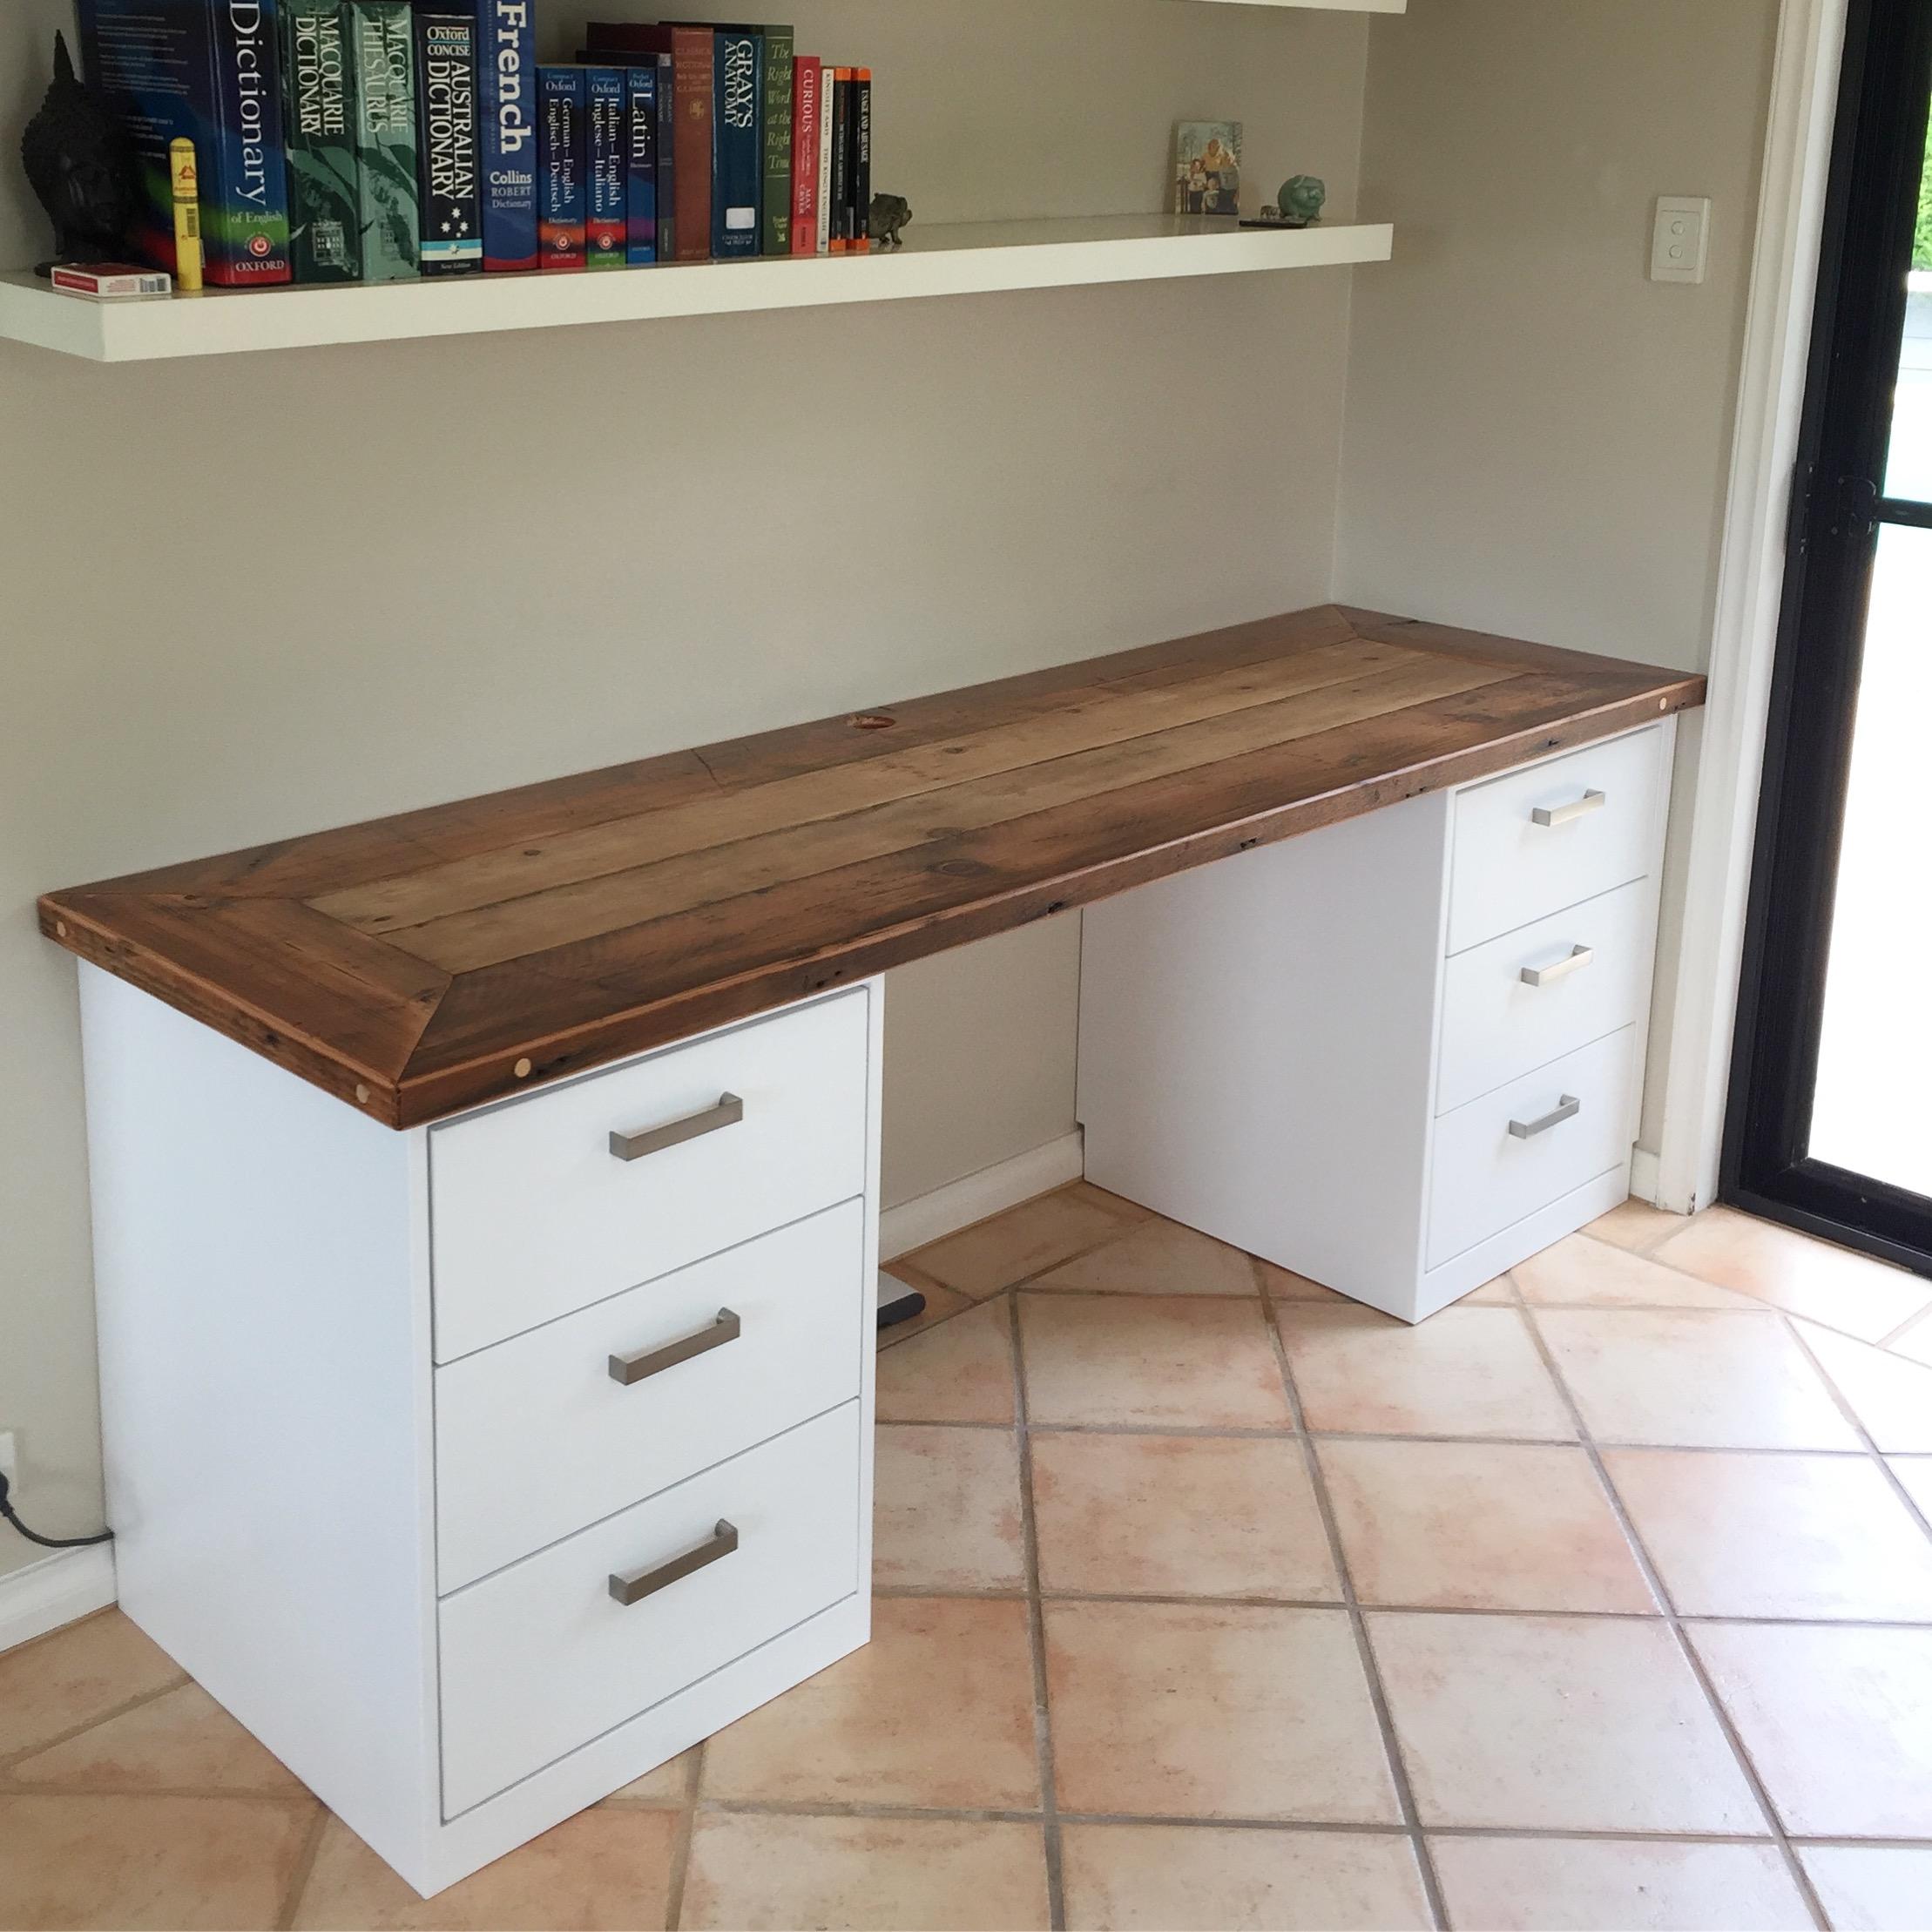 The 'Grove' Study desk